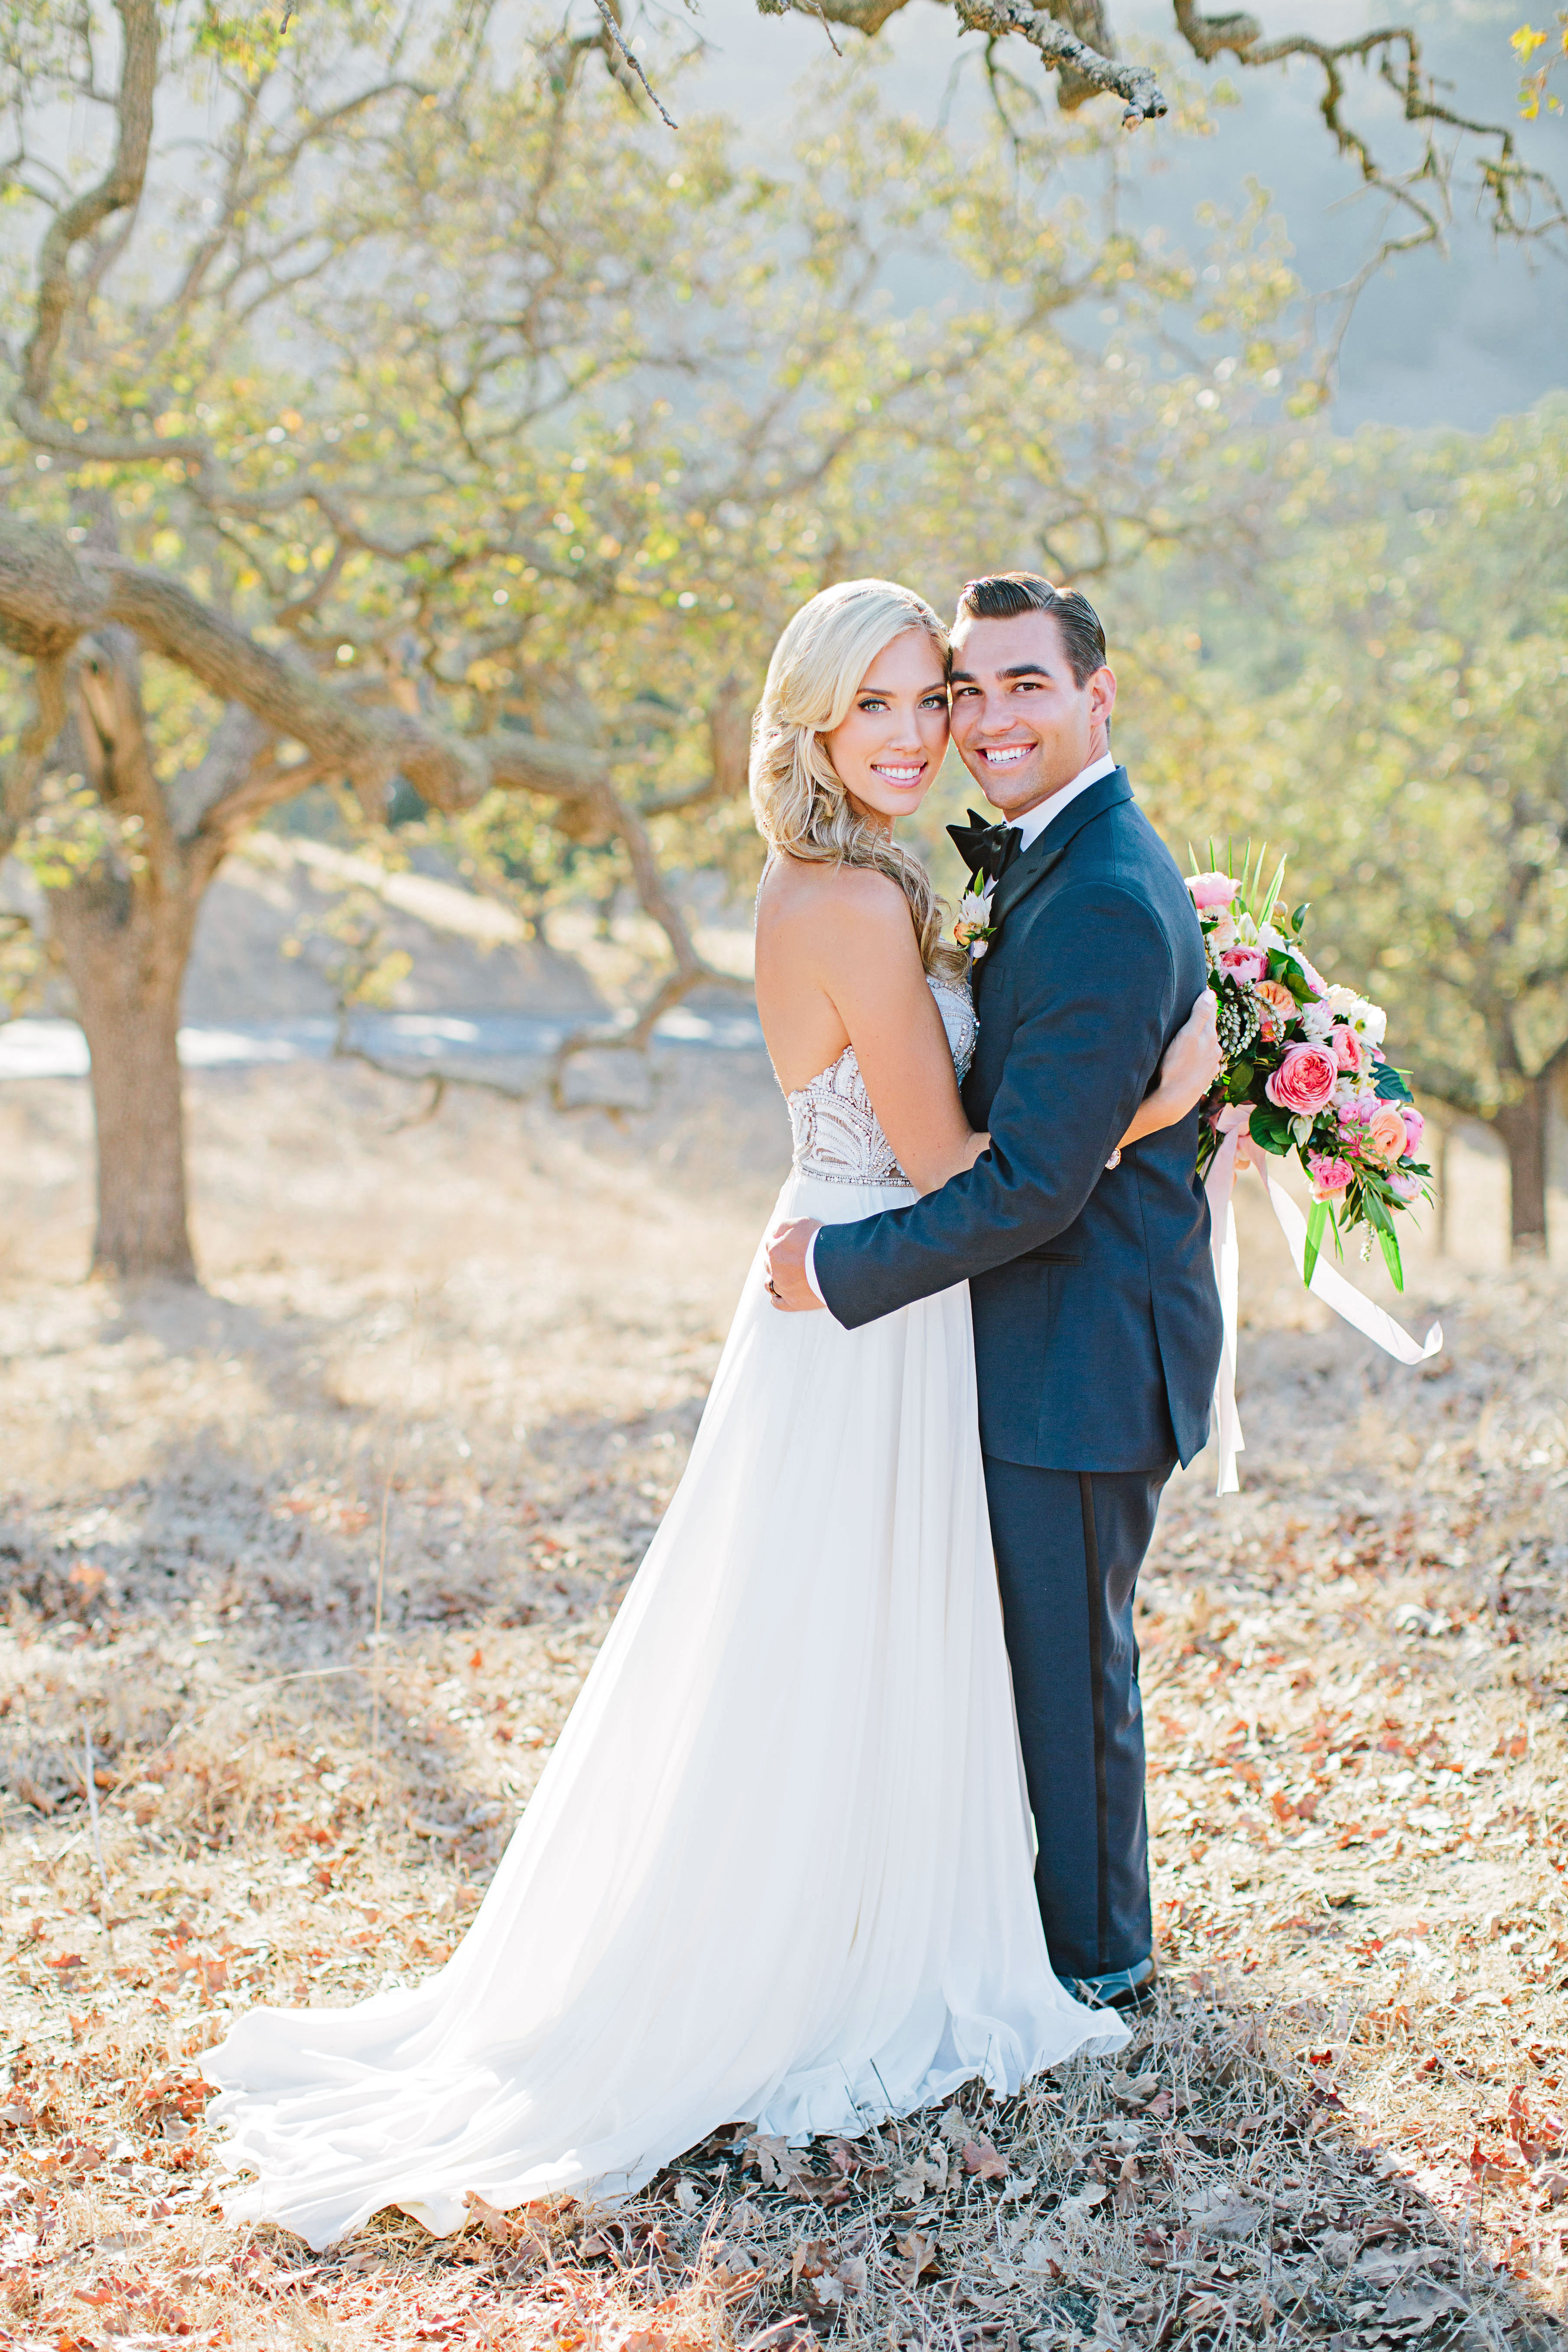 stephanie jared wedding couple